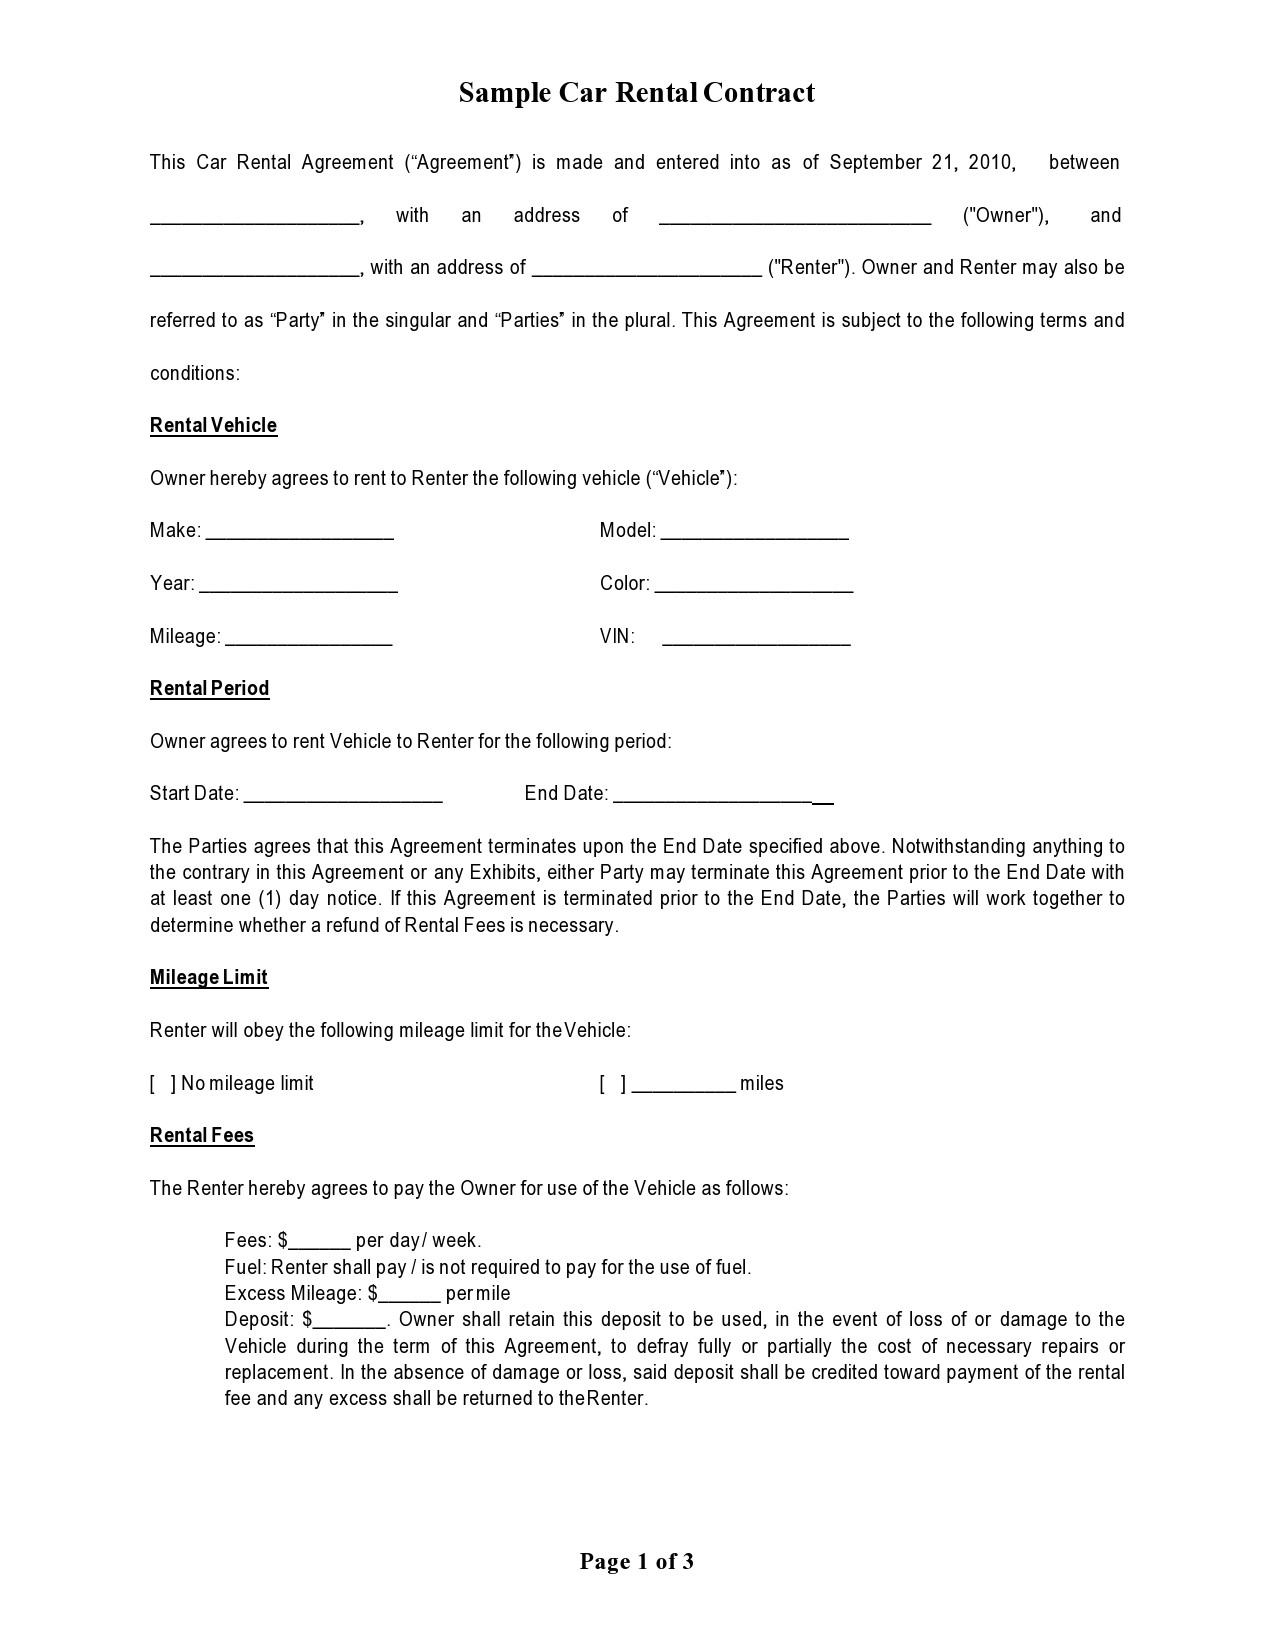 Free car rental agreement 18